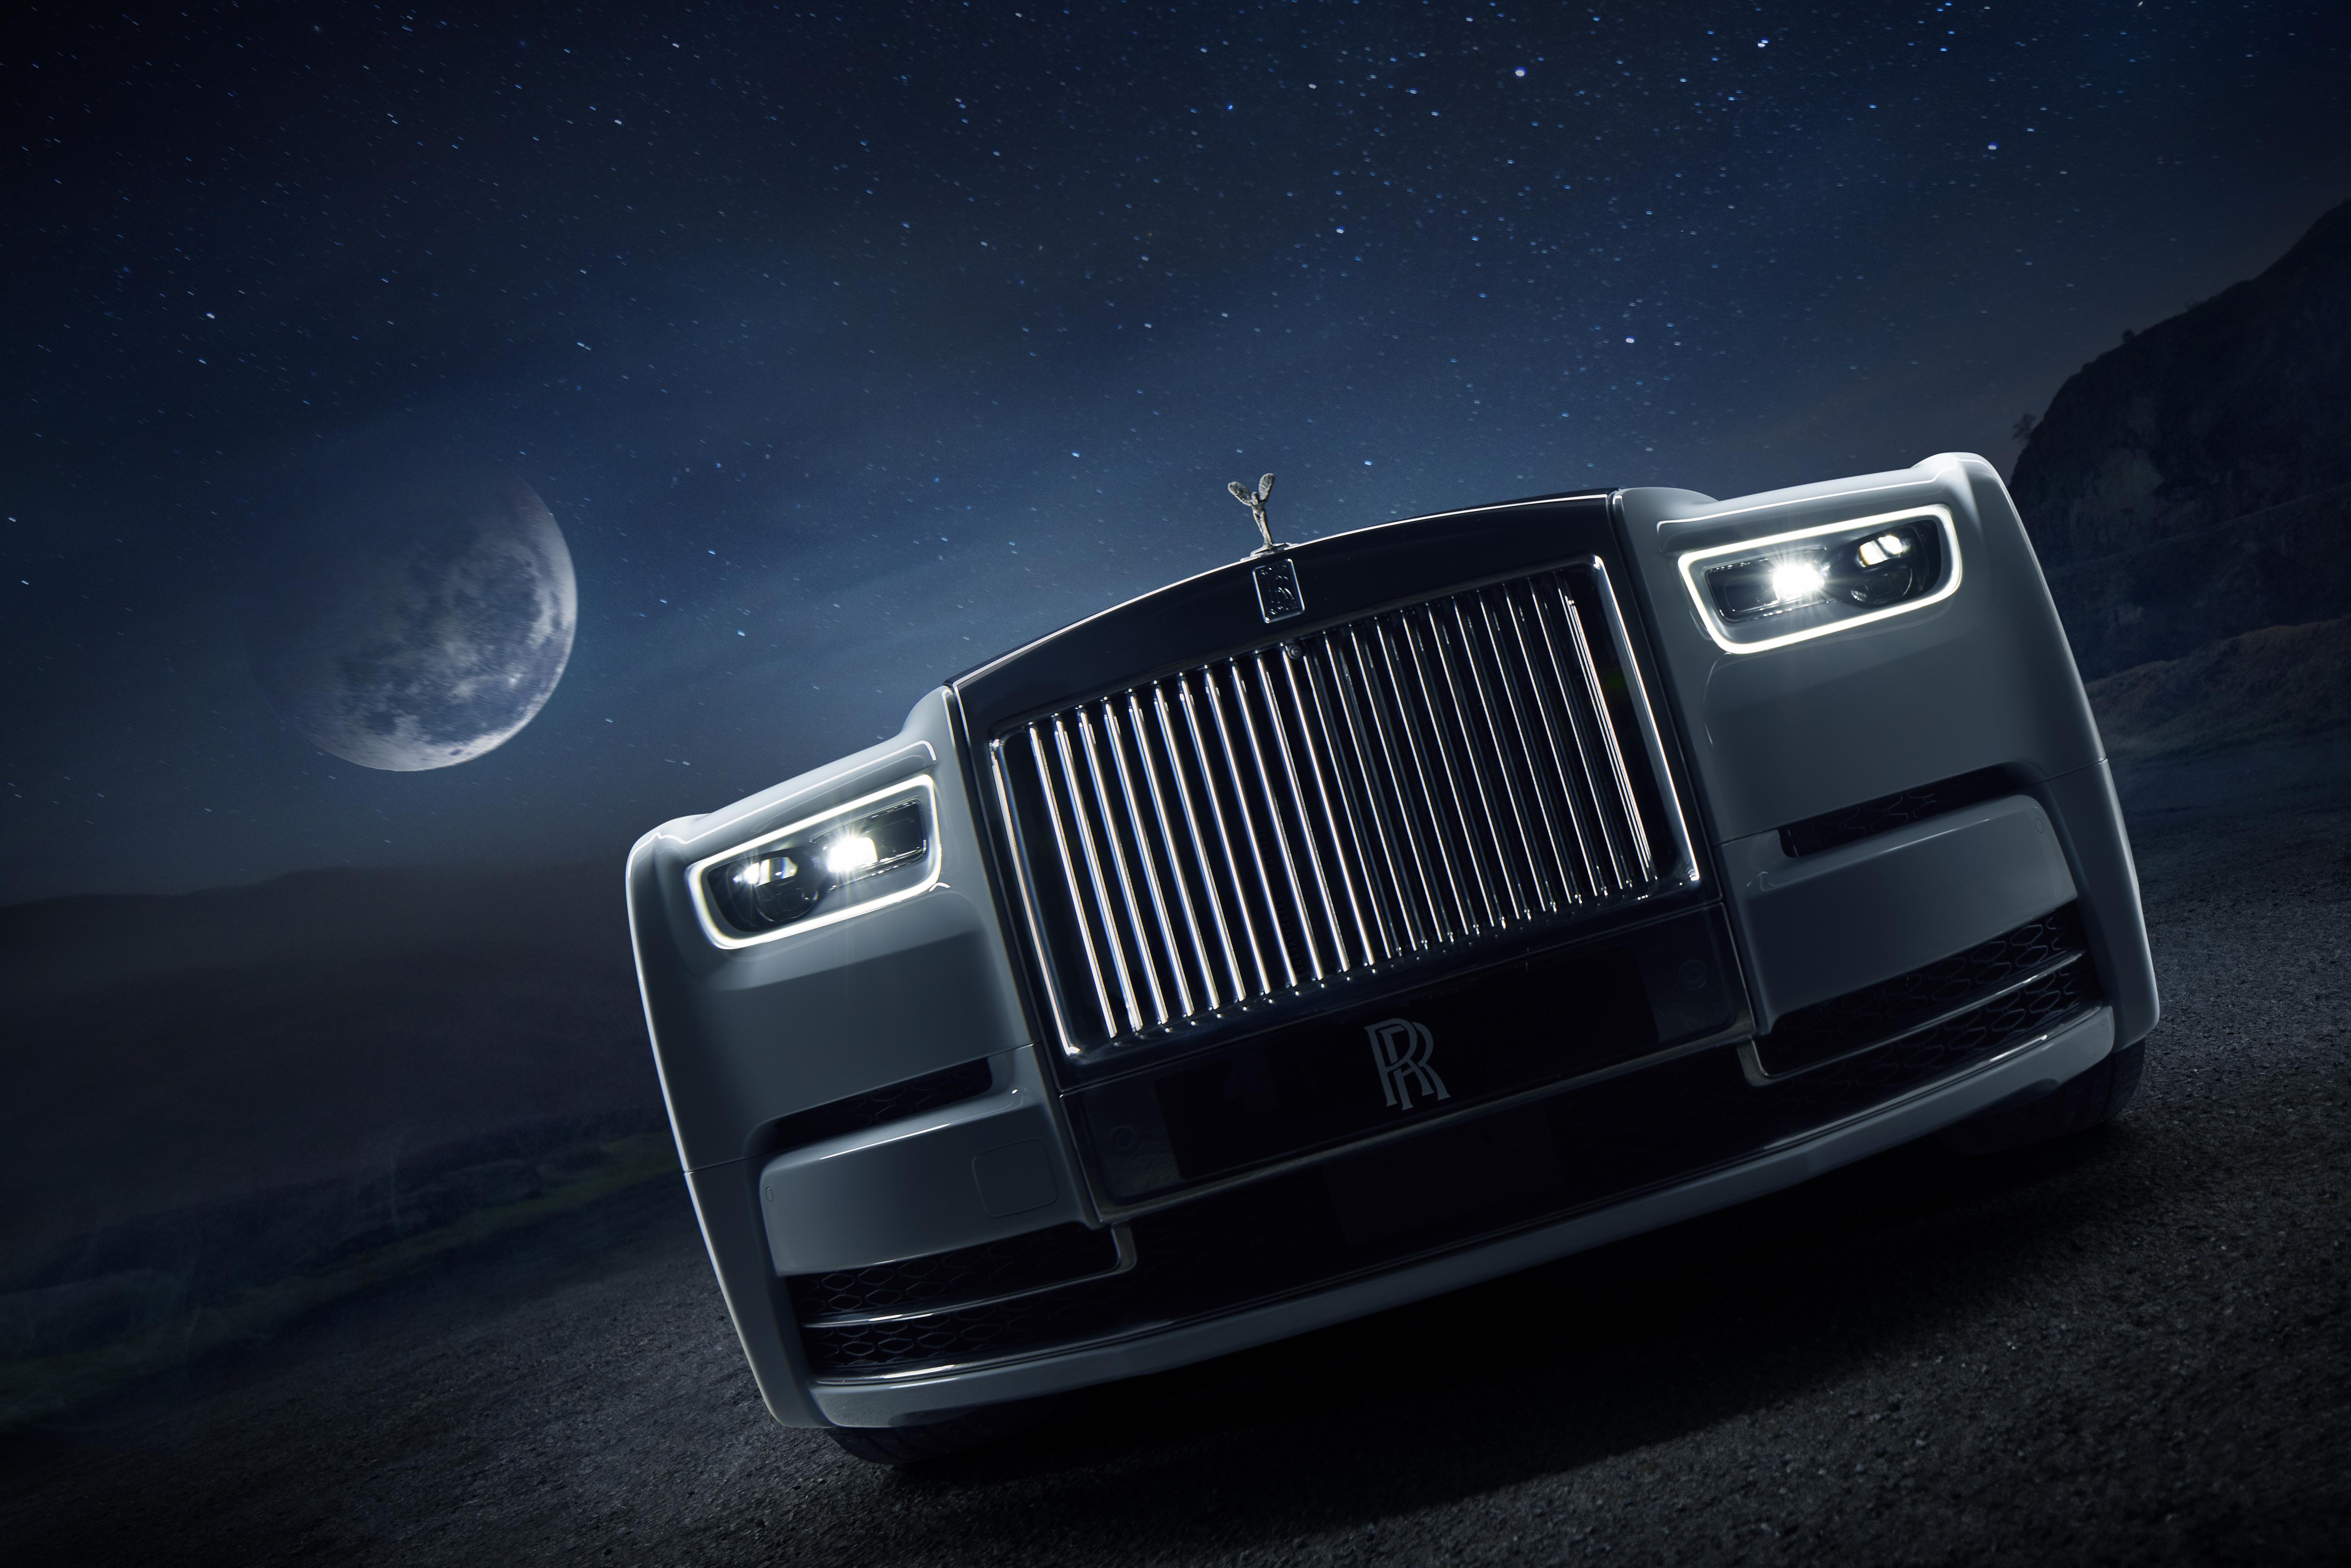 2019 Rolls Royce Phantom Tranquillity Hd Cars 4k